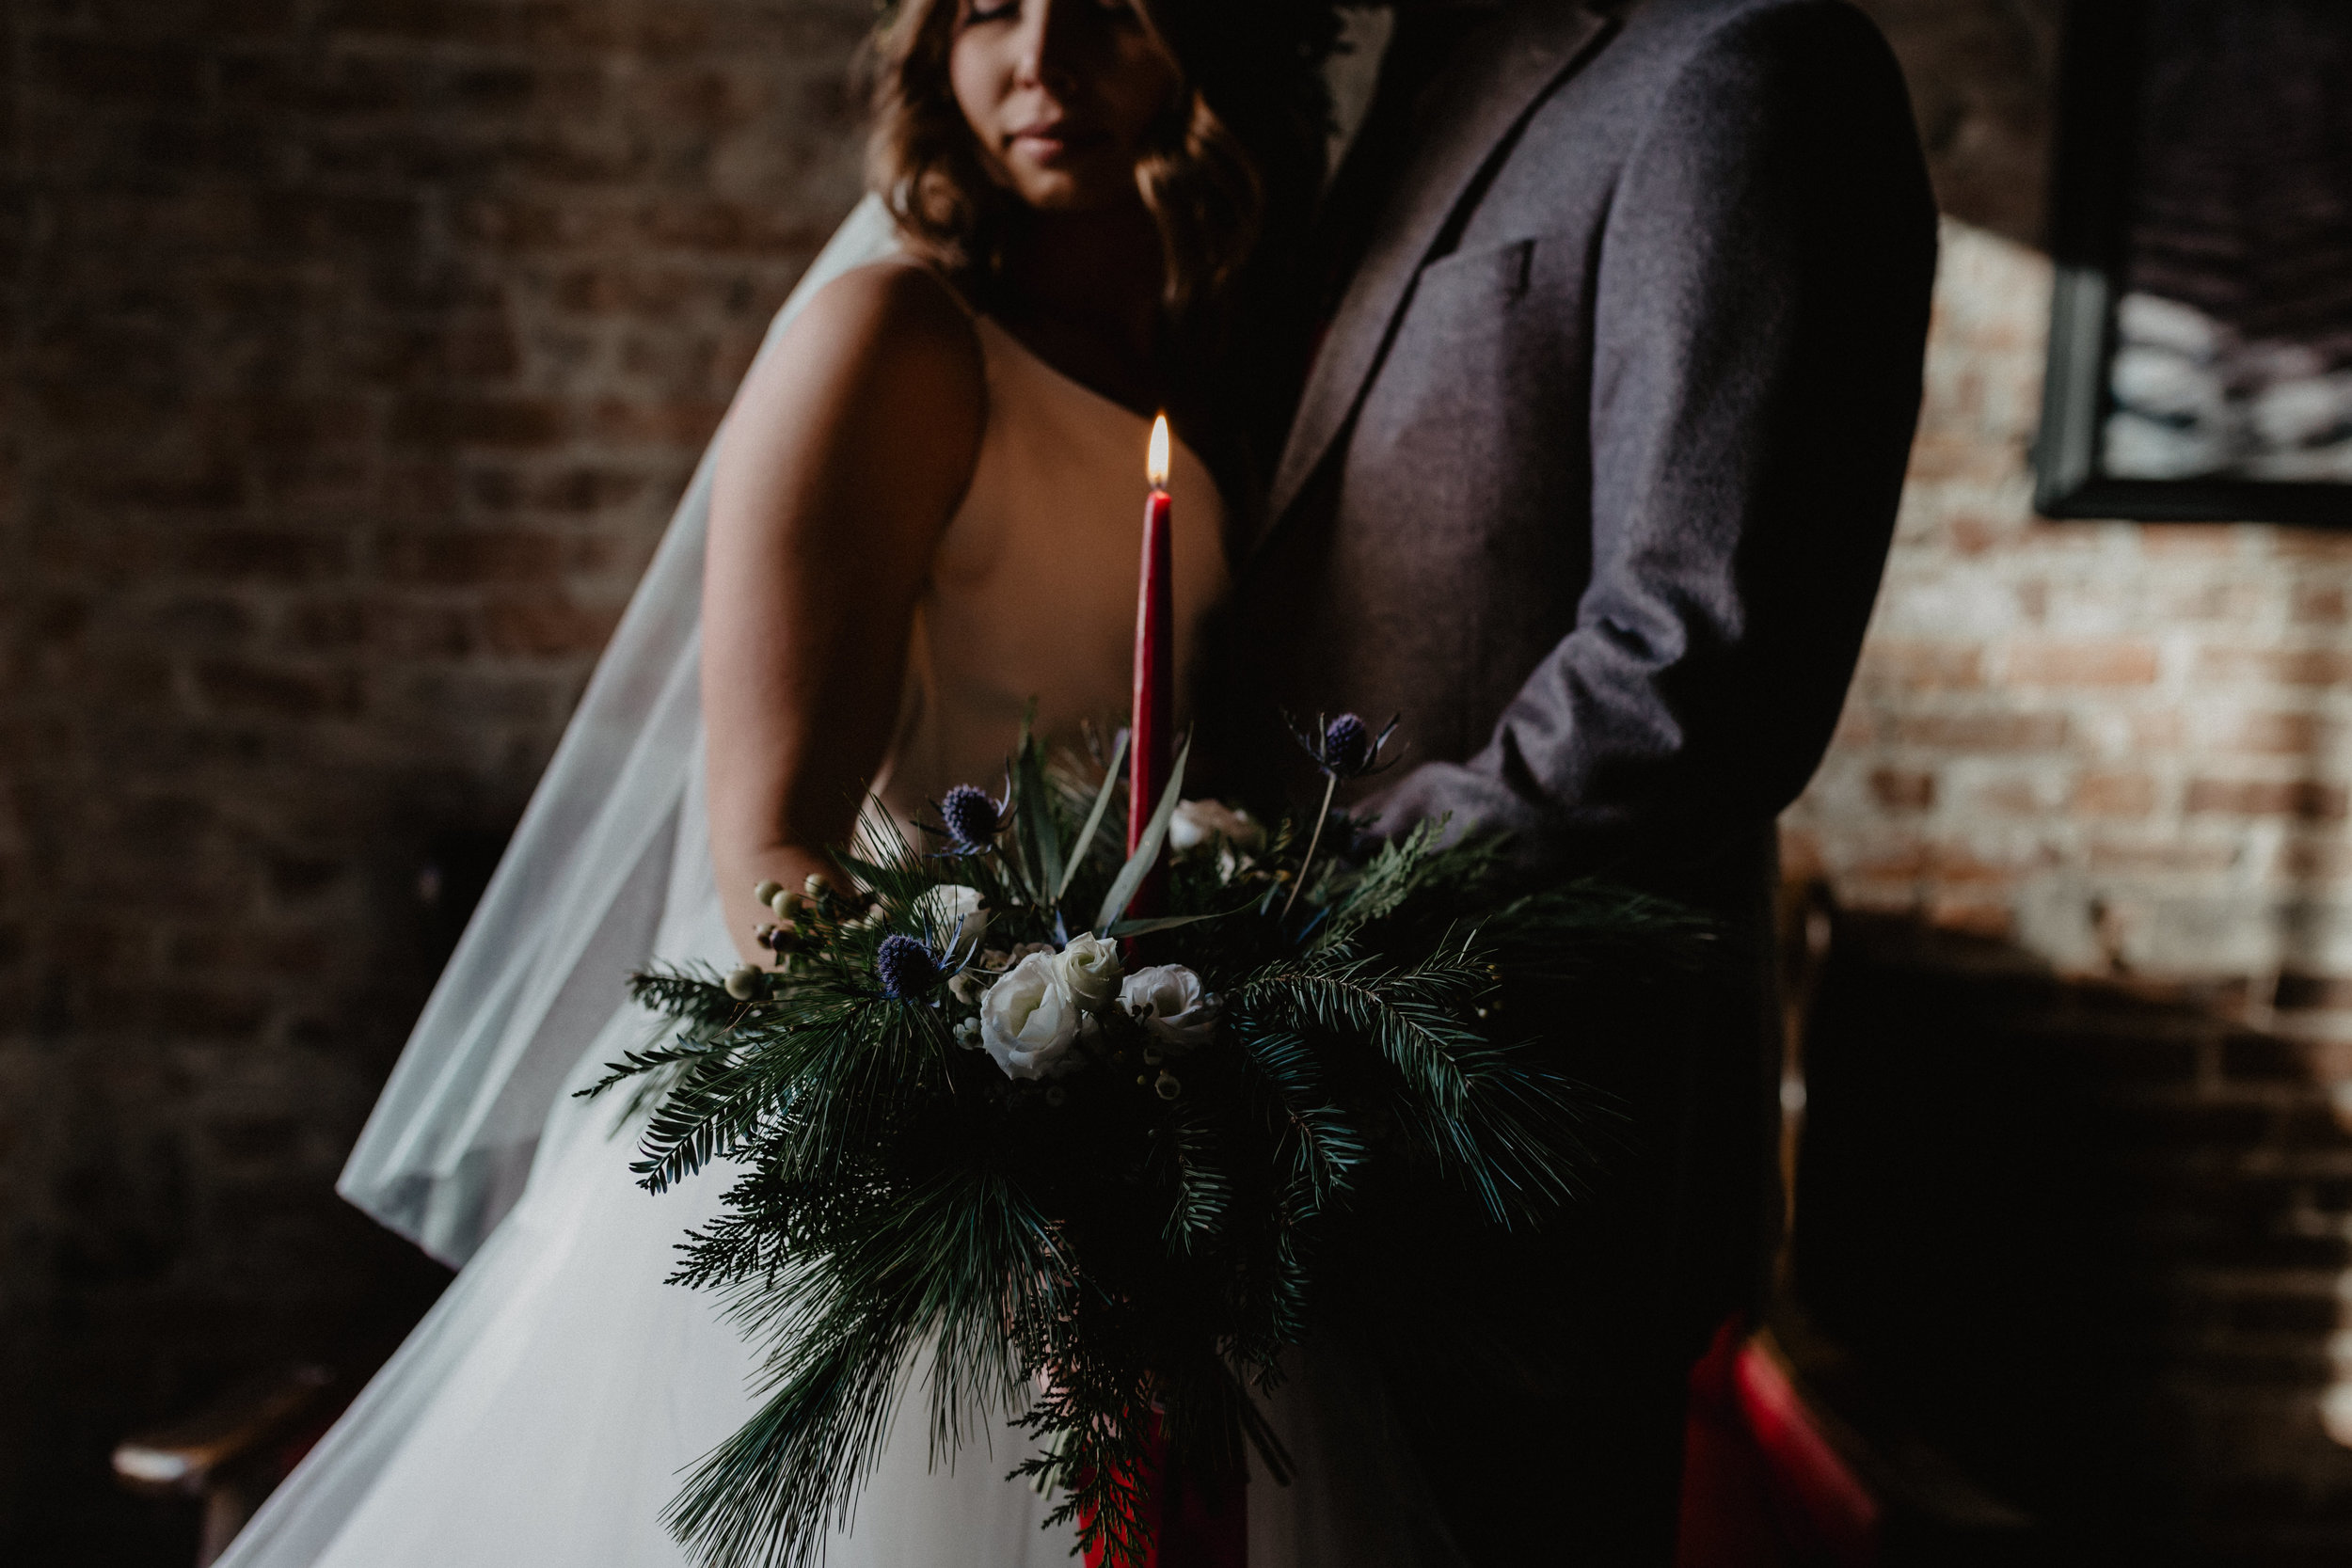 lucas_confectionery_wedding-50.jpg